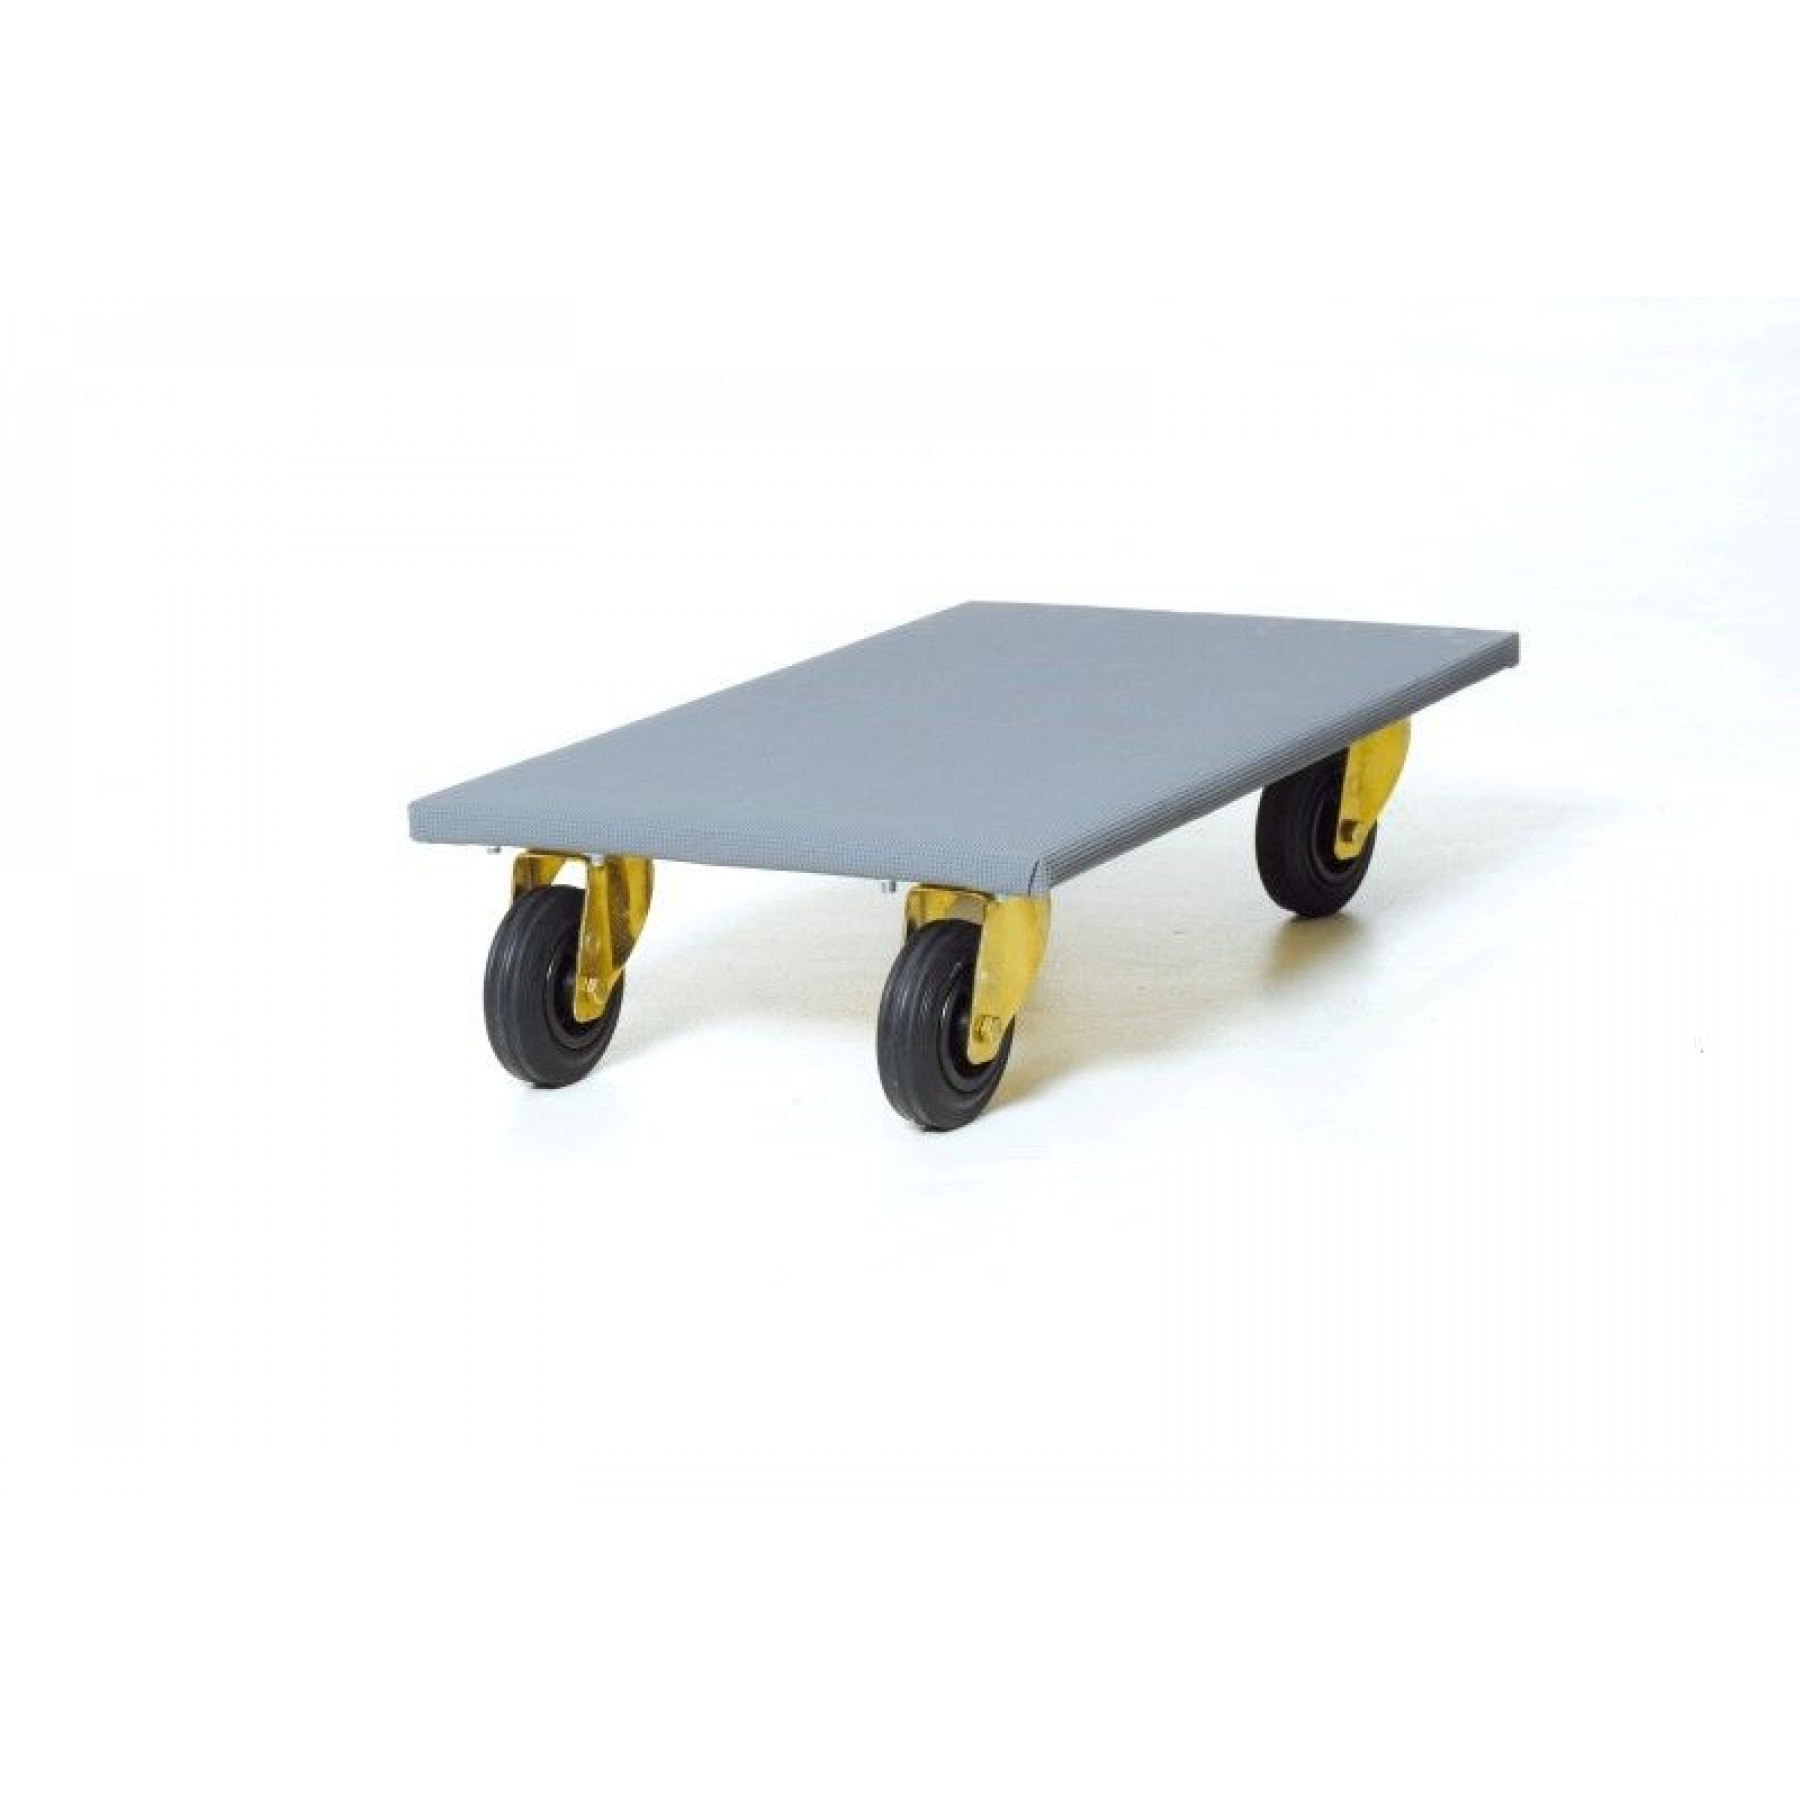 Meubelroller 600x500 mm met rubber wielen, 212.777